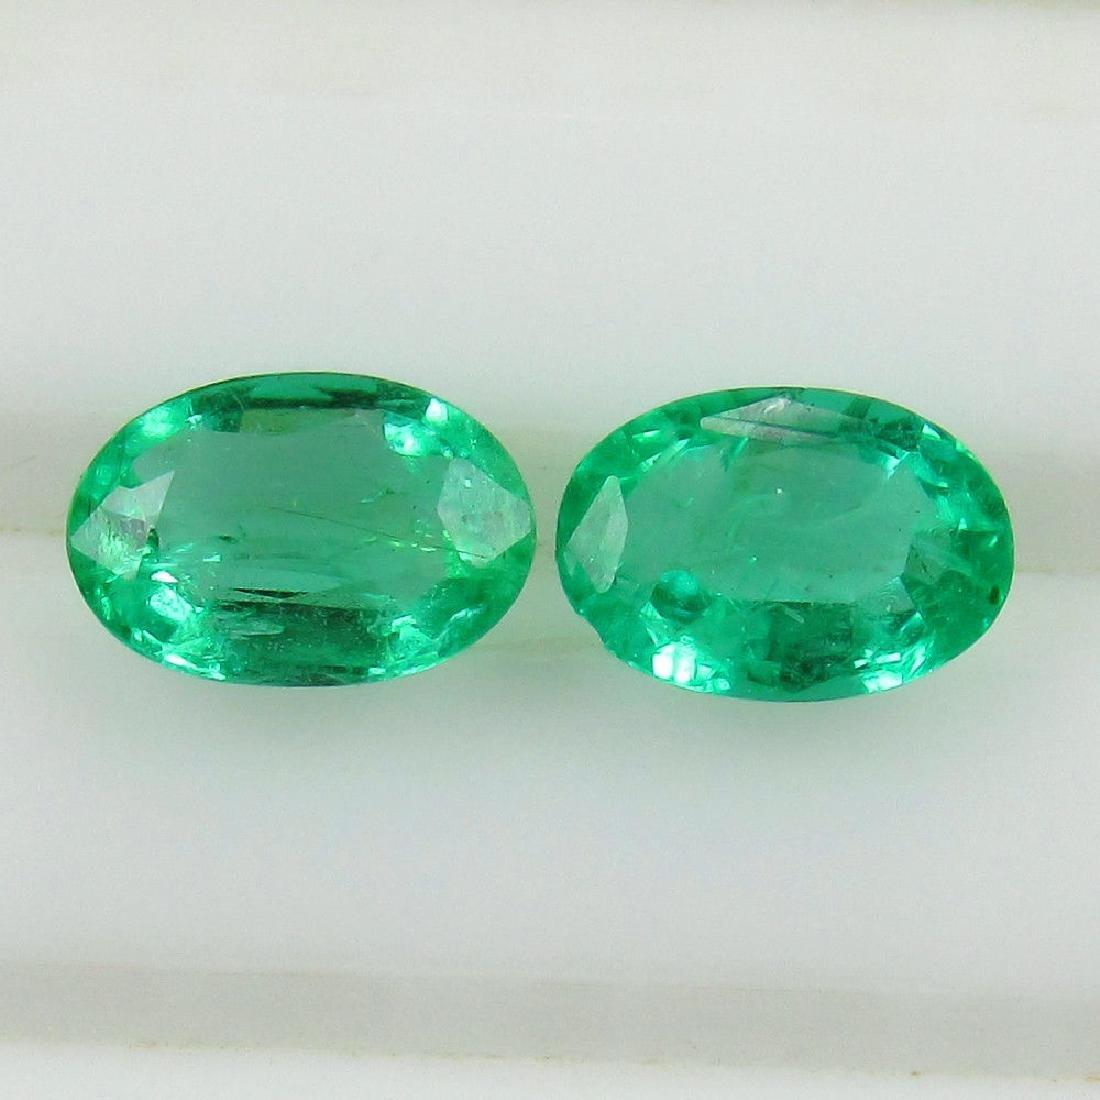 0.83 Carat Natural Zambian Emerald Oval Pair